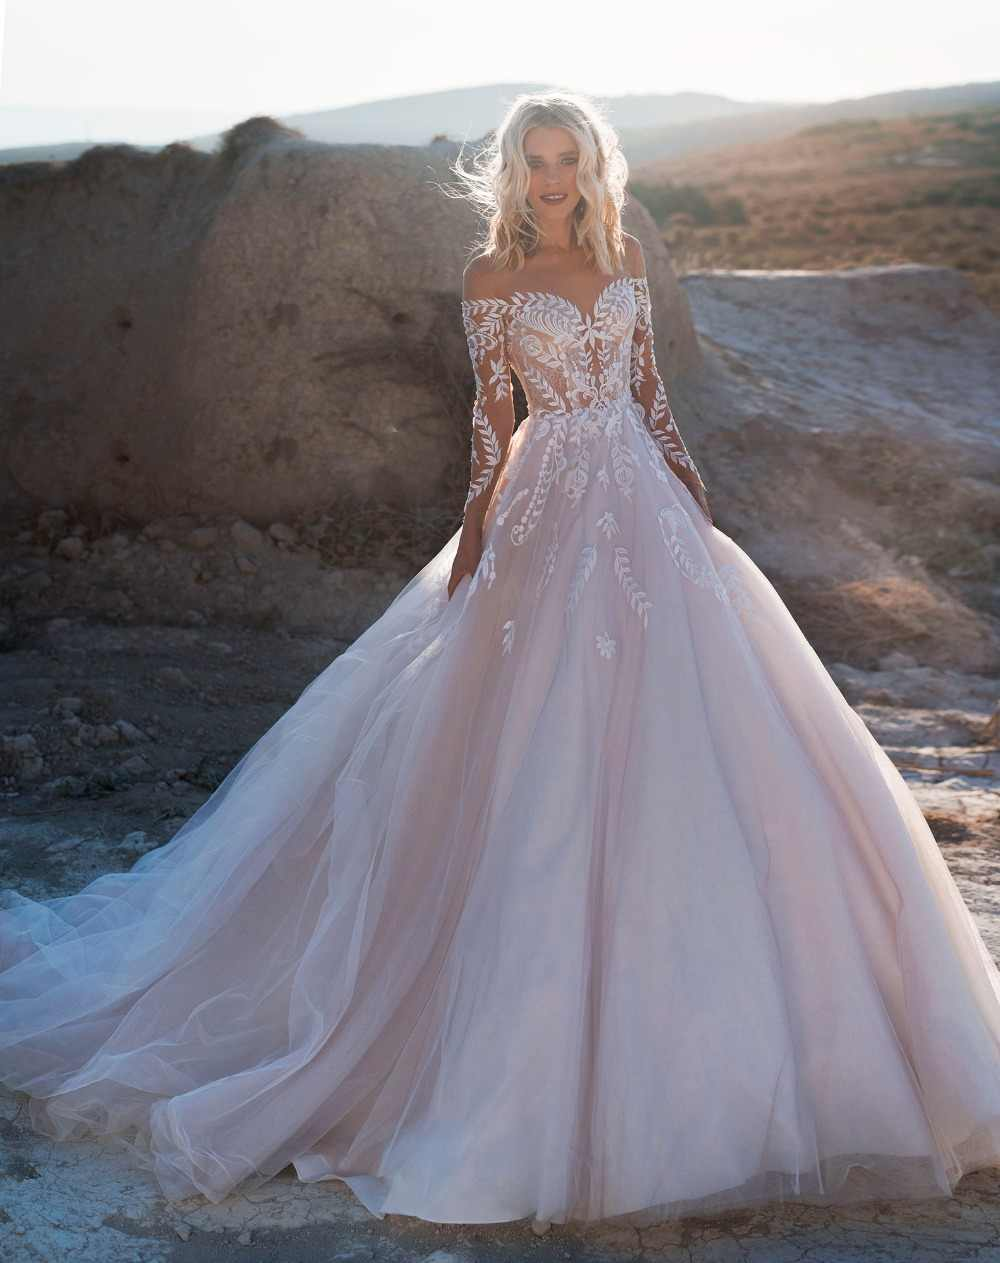 2019 boêmio vestidos de casamento fora do ombro mangas compridas rendas apliques vestidos de noiva trem varredura vestido de casamento robe de mariee